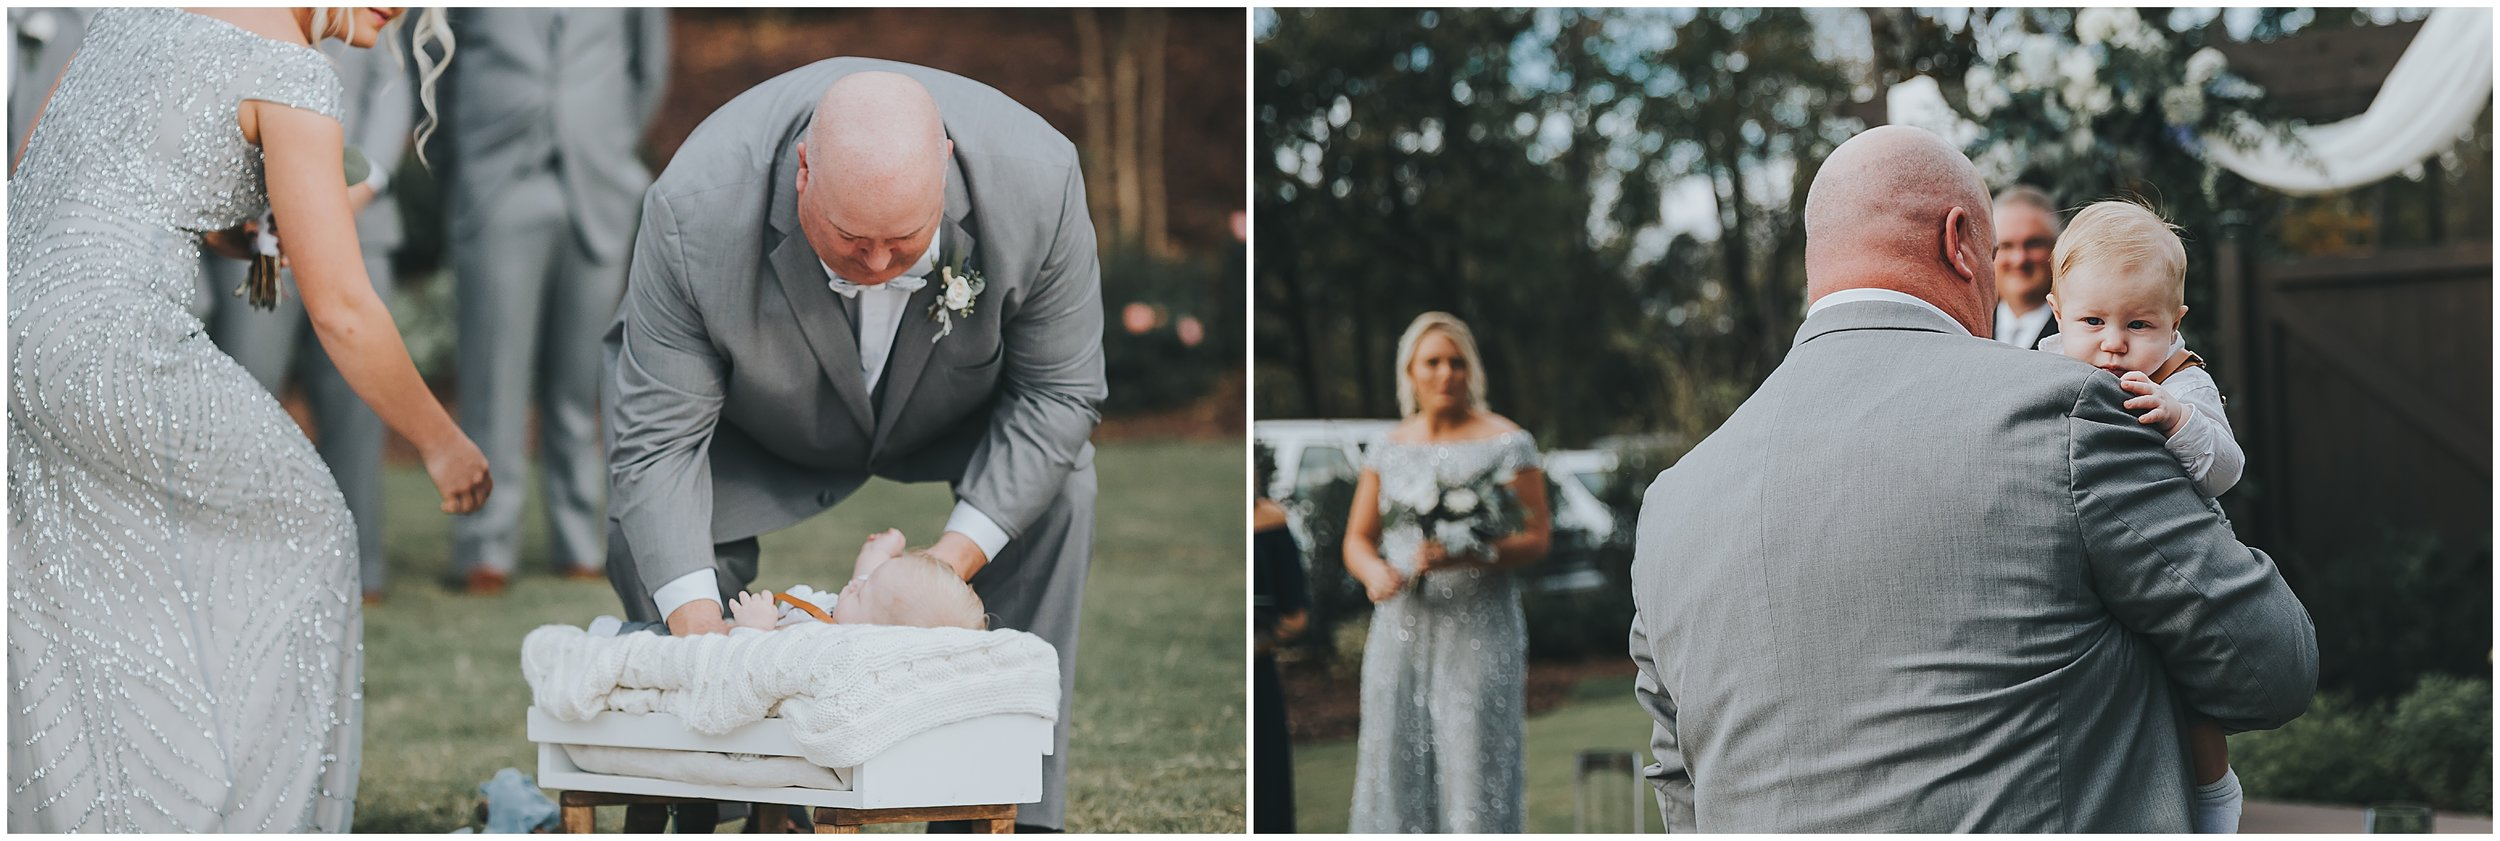 Charlotte NC wedding photographer_0401.jpg